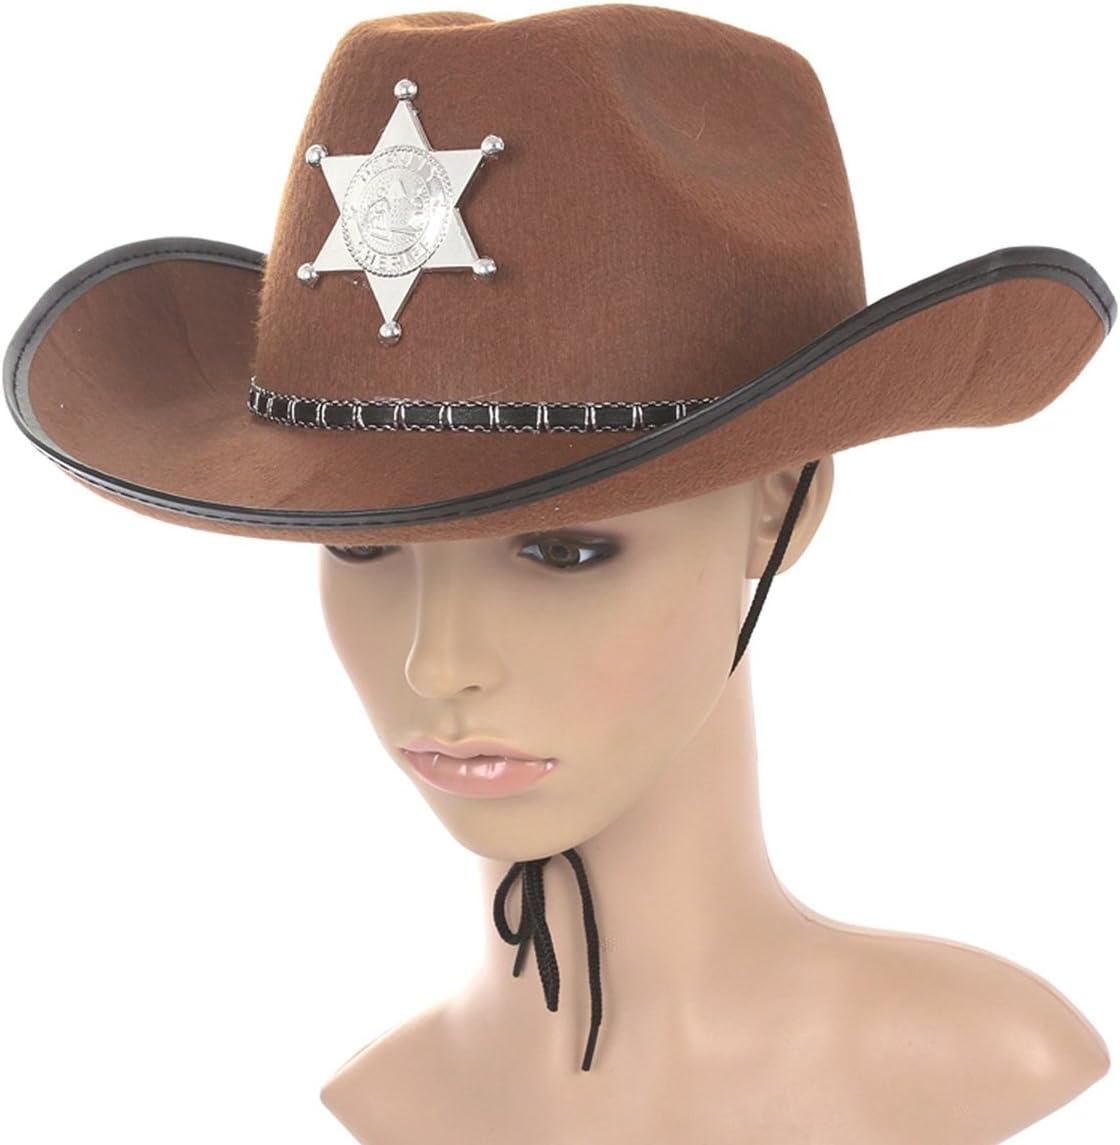 winomo Cowboy Western Wilden chalecos Sheriff sombrero para ...